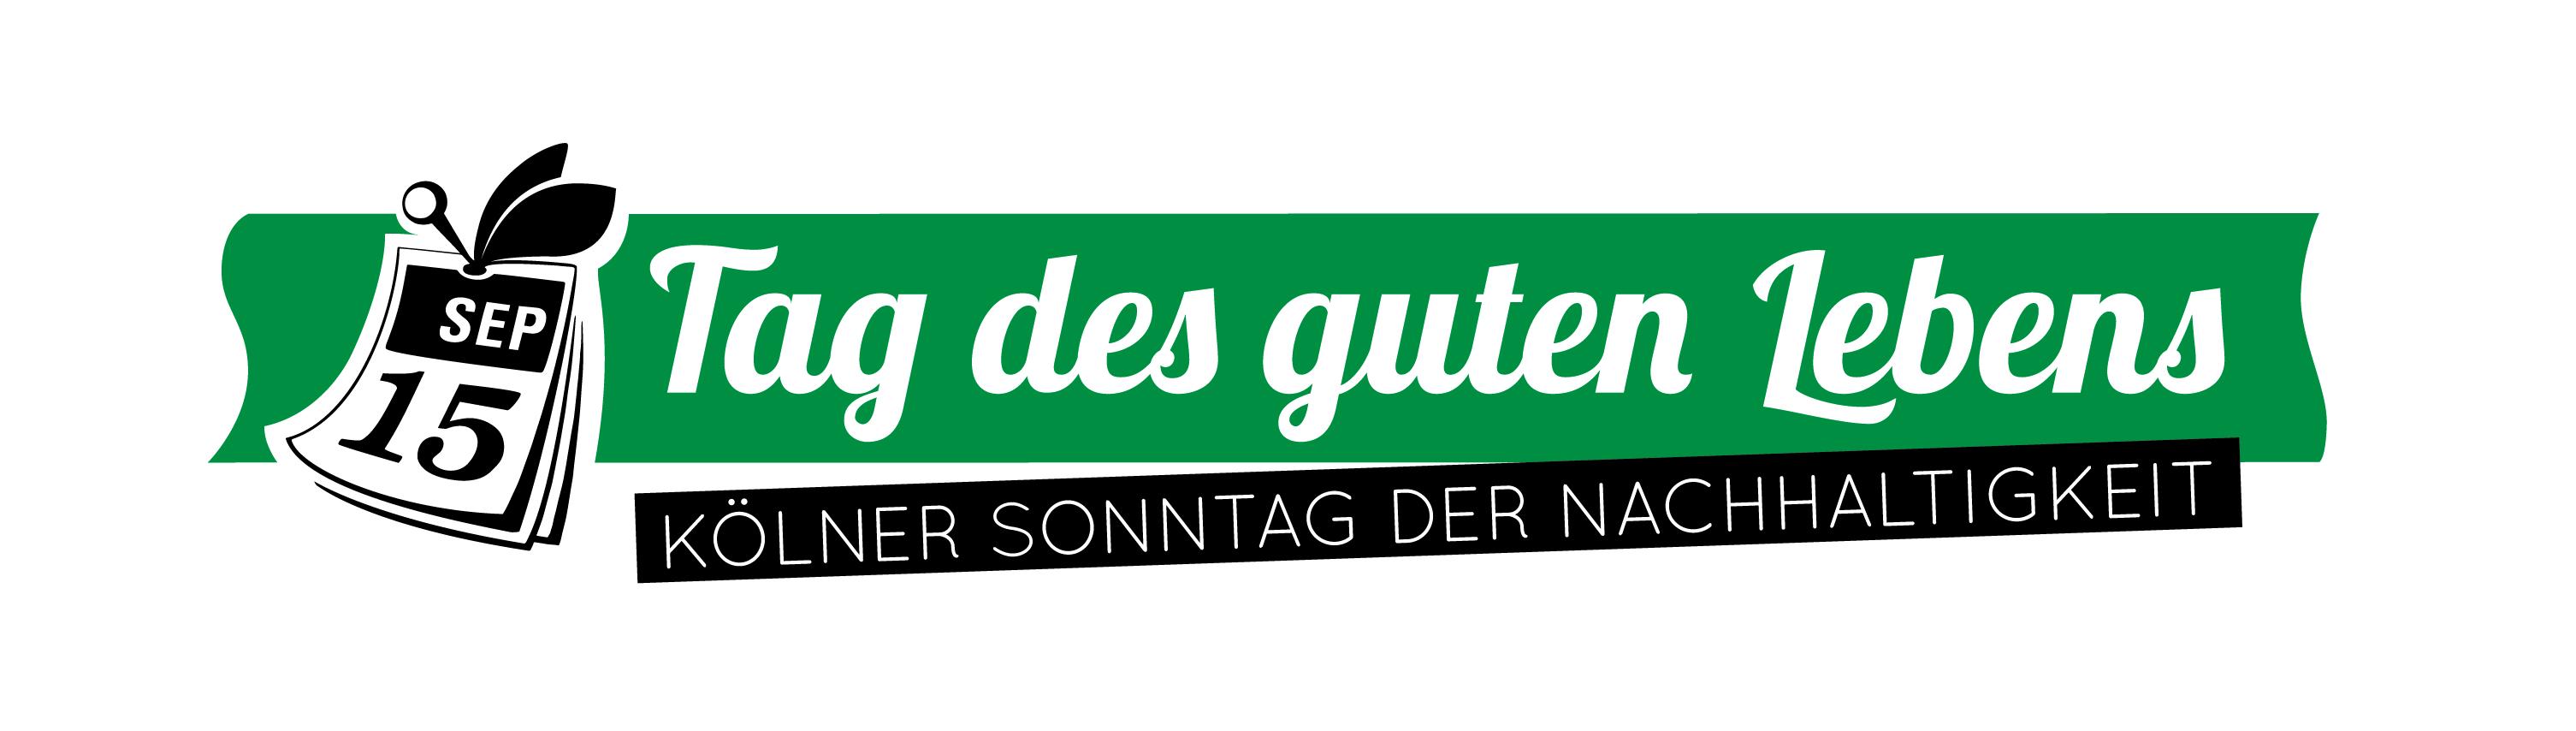 RZ_logo_tdgl_auffotos